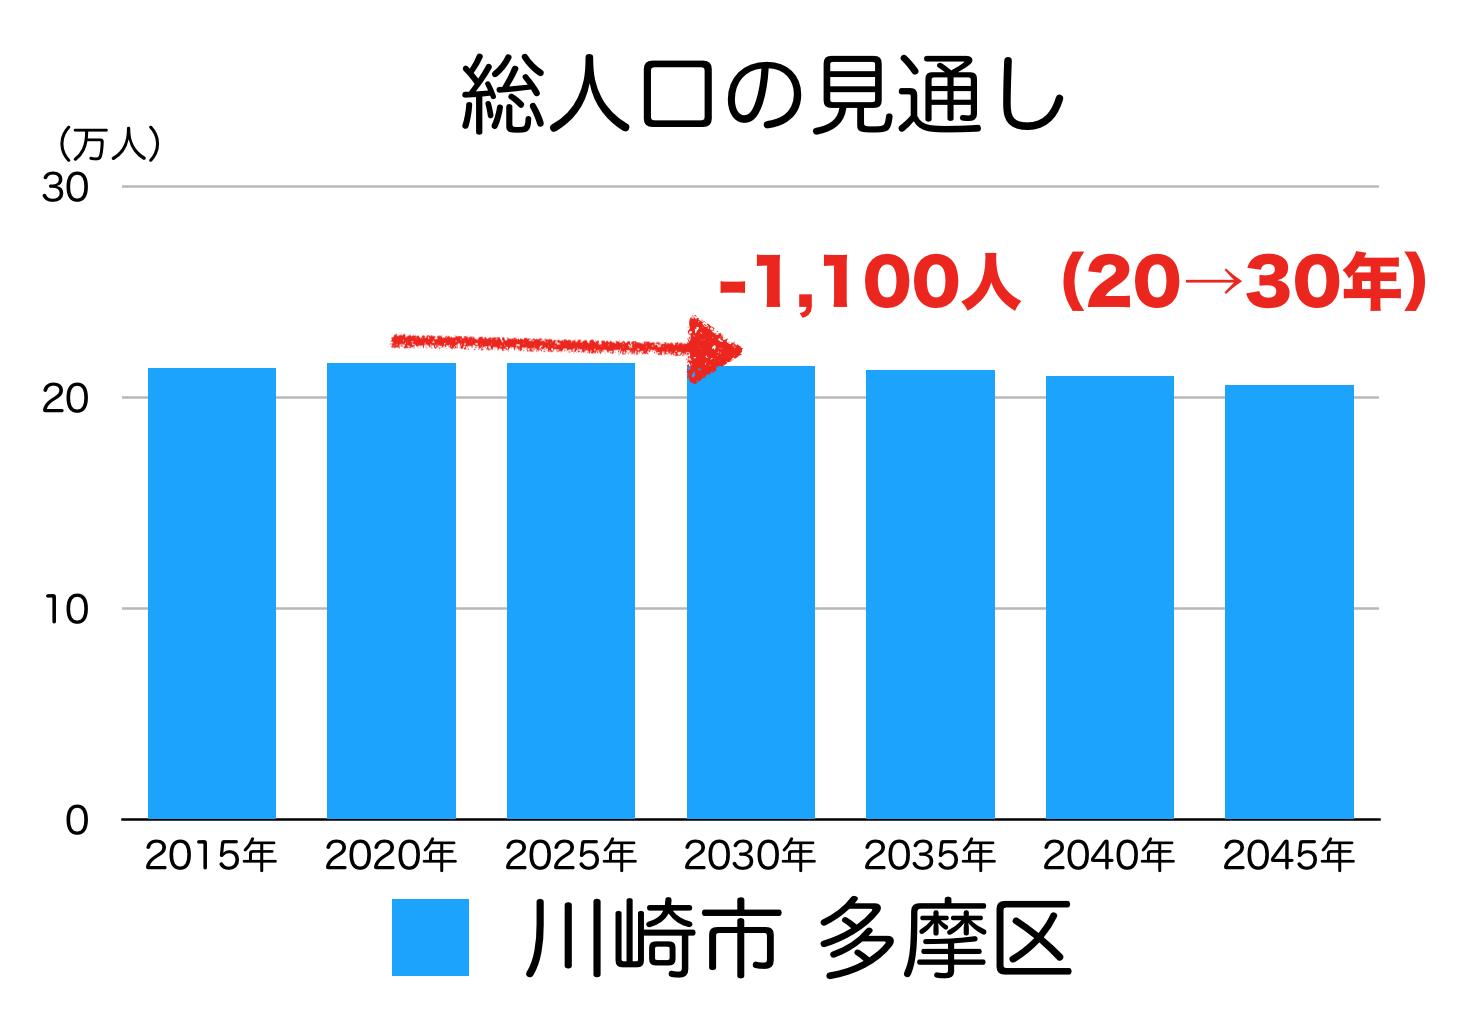 川崎市多摩区の人口予測